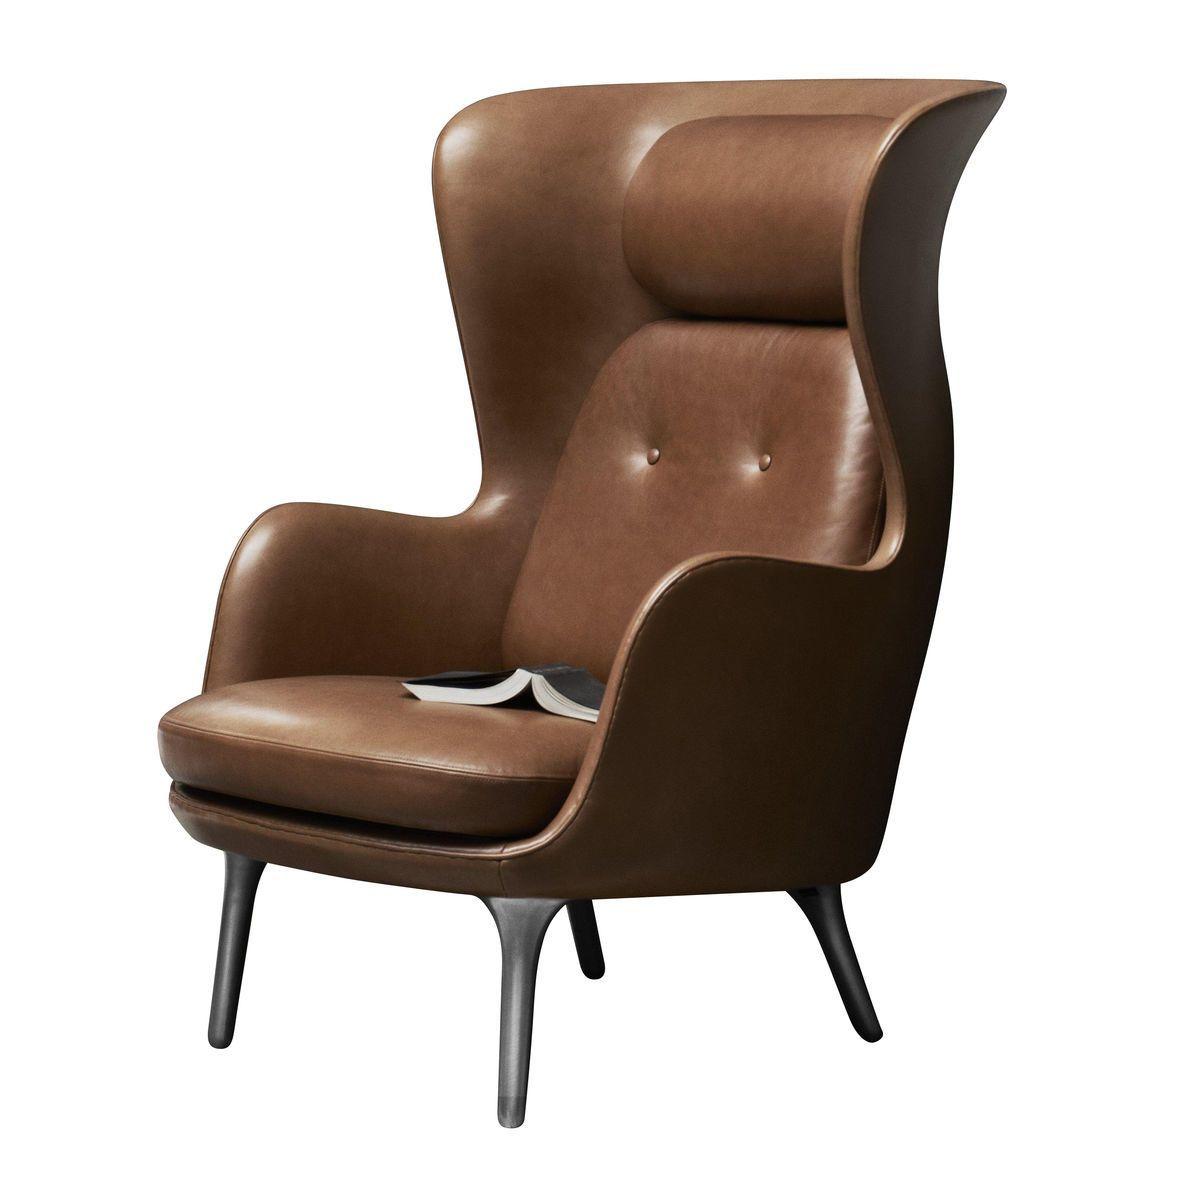 Ro Wingback Chair Leather  Fritz Hansen  AmbienteDirectcom